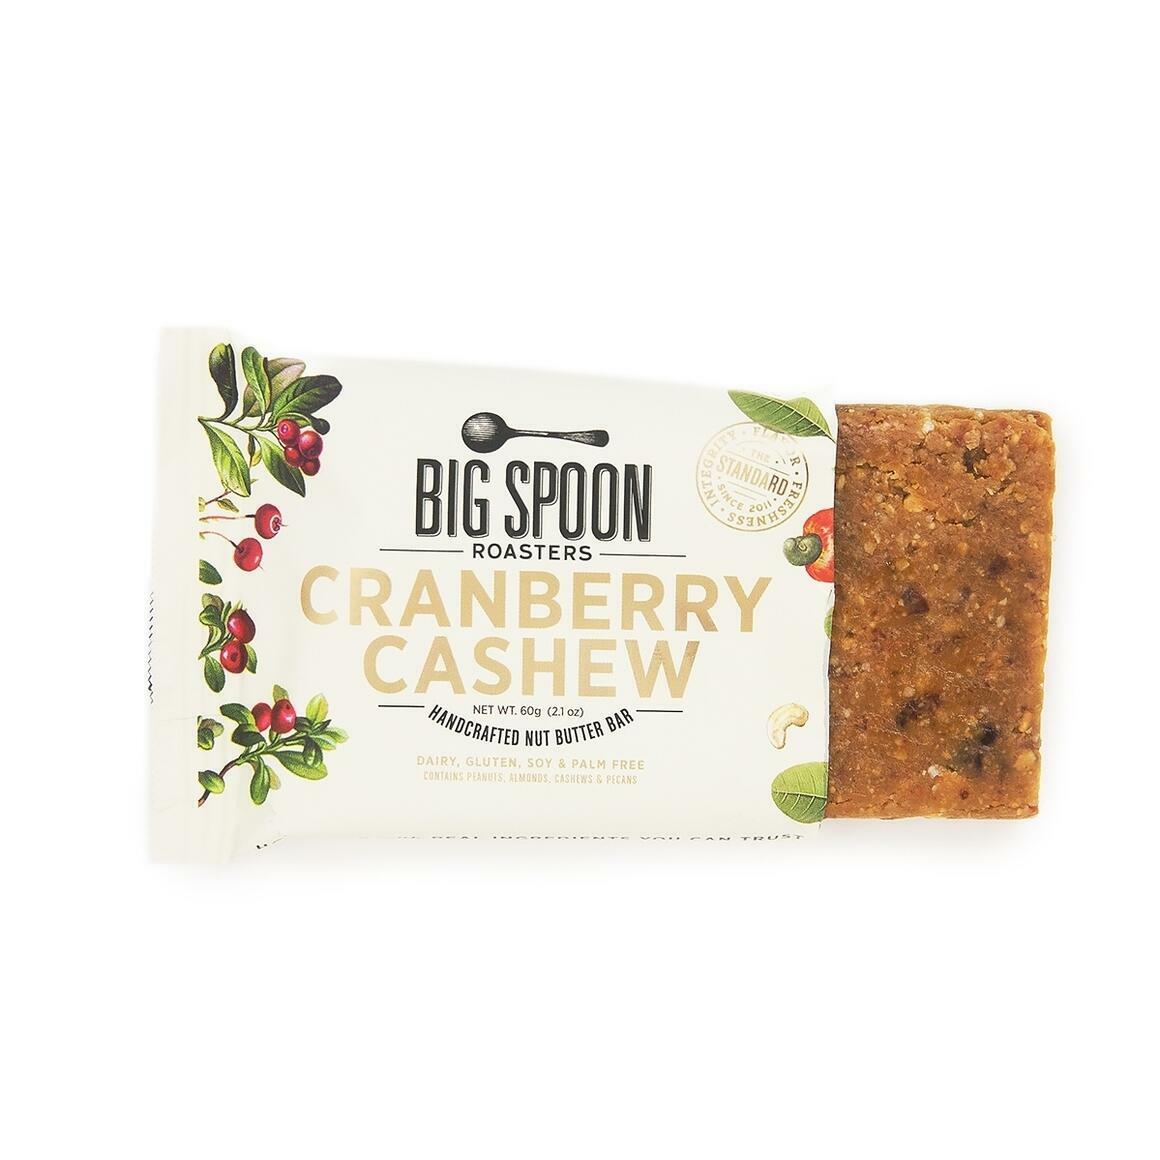 Big Spoon Roasters Cranberry Cashew | Trada Marketplace